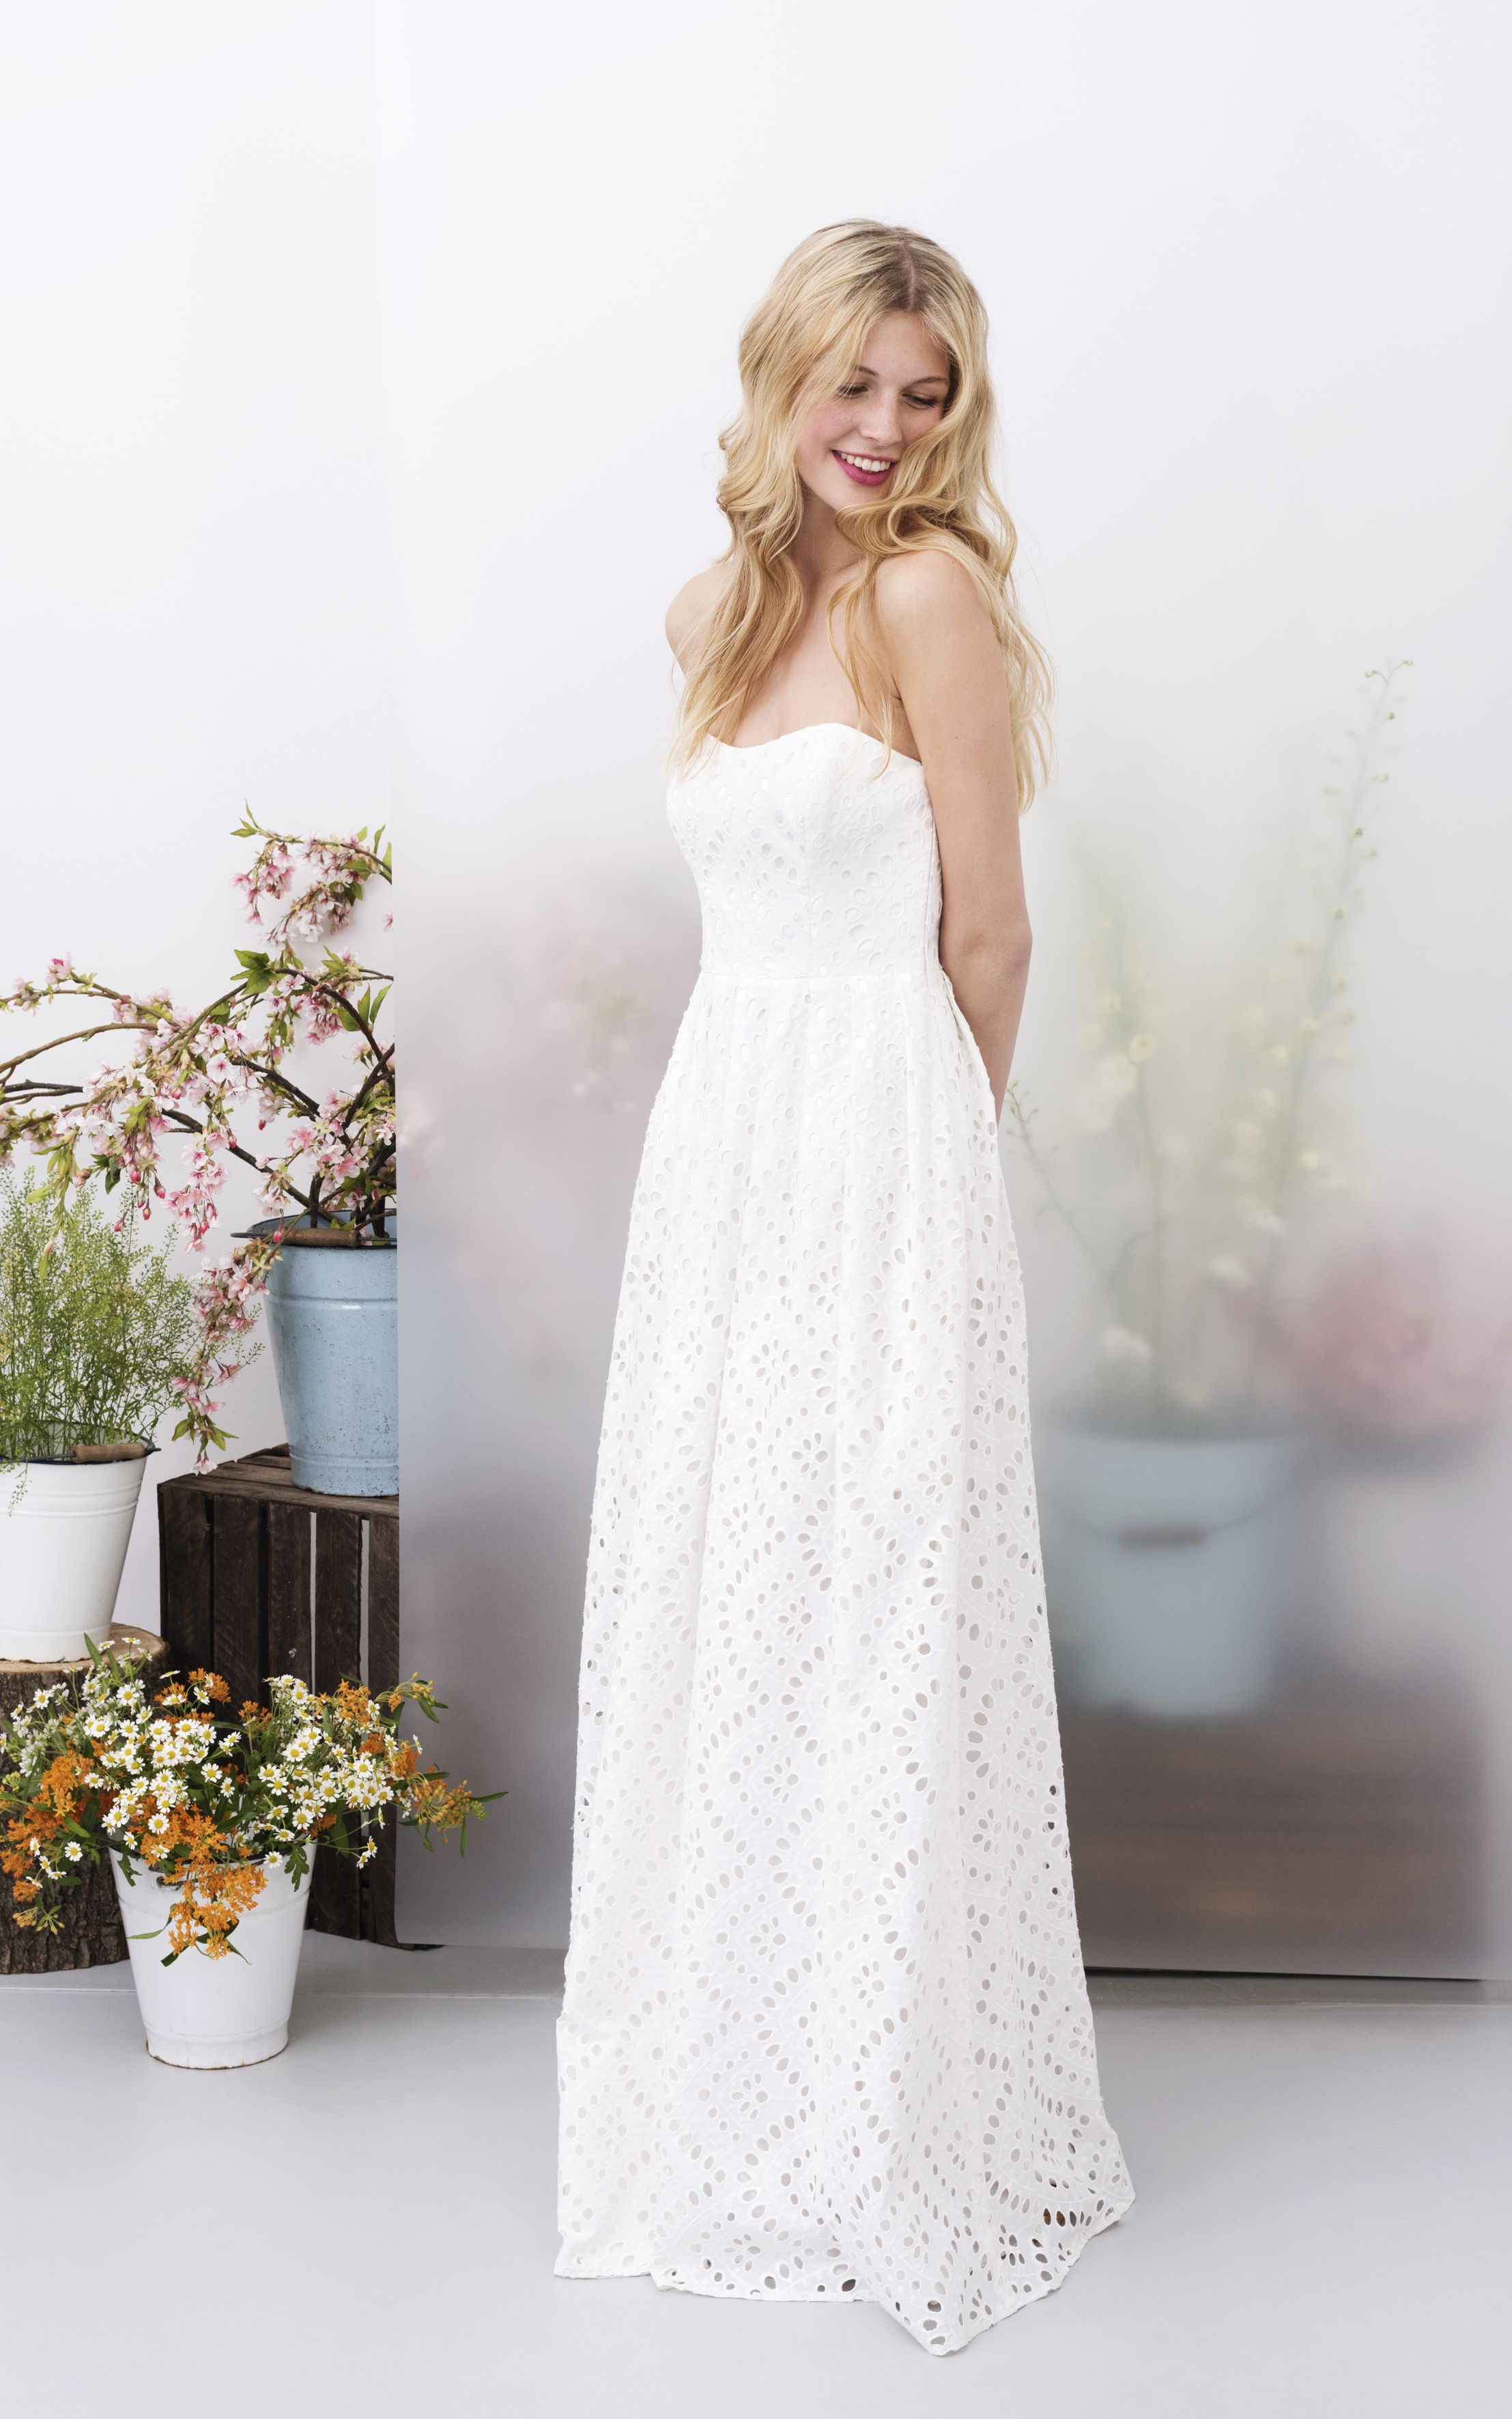 kisui OUI Collection Bridal Style: sunna, Brautkleid, Weddingdress ...